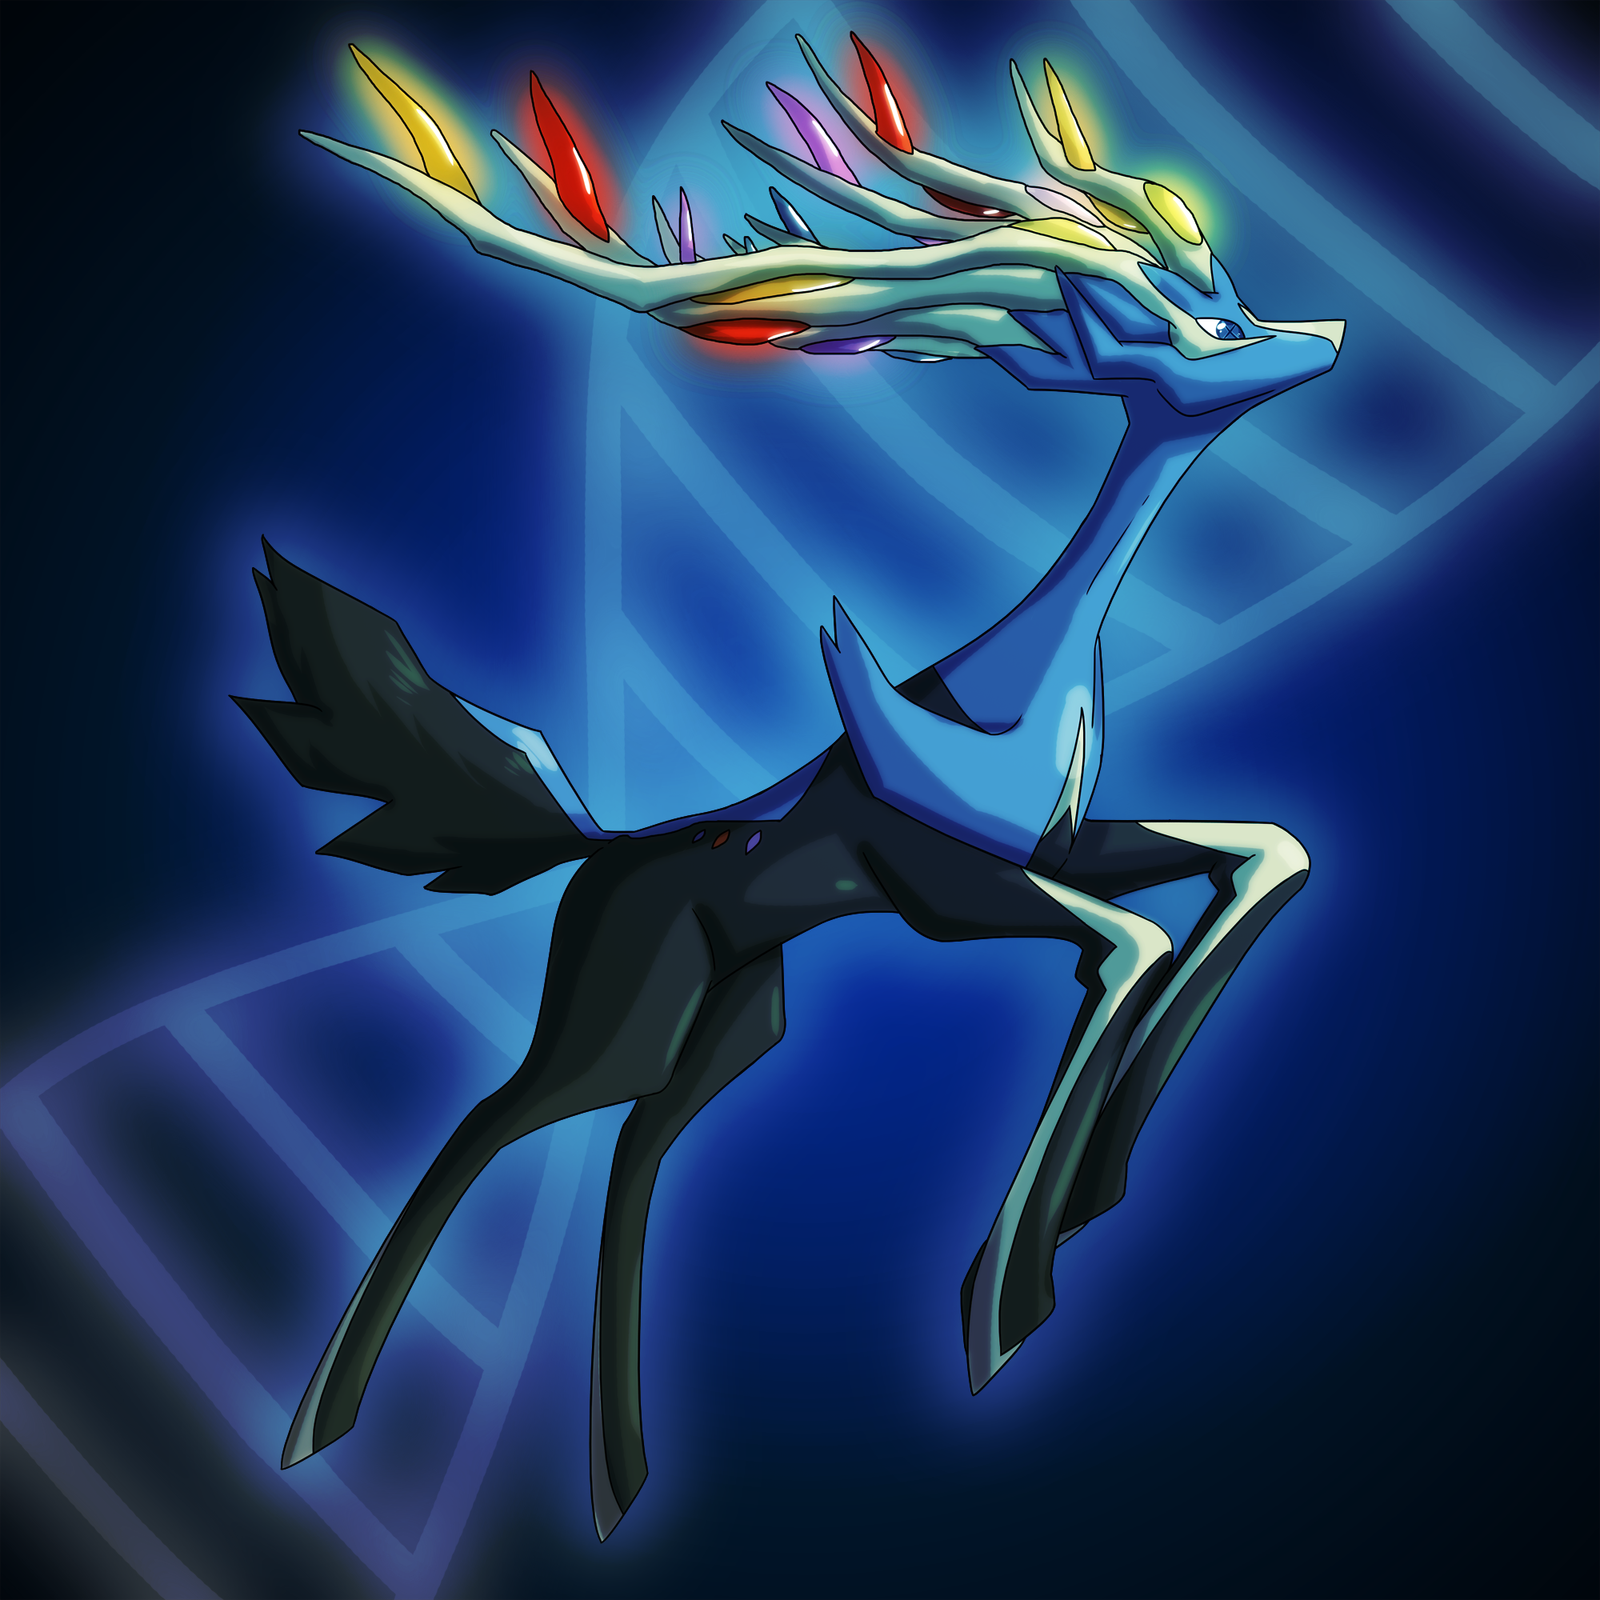 Pokemon X: Xerneas by DrCrafty on DeviantArt